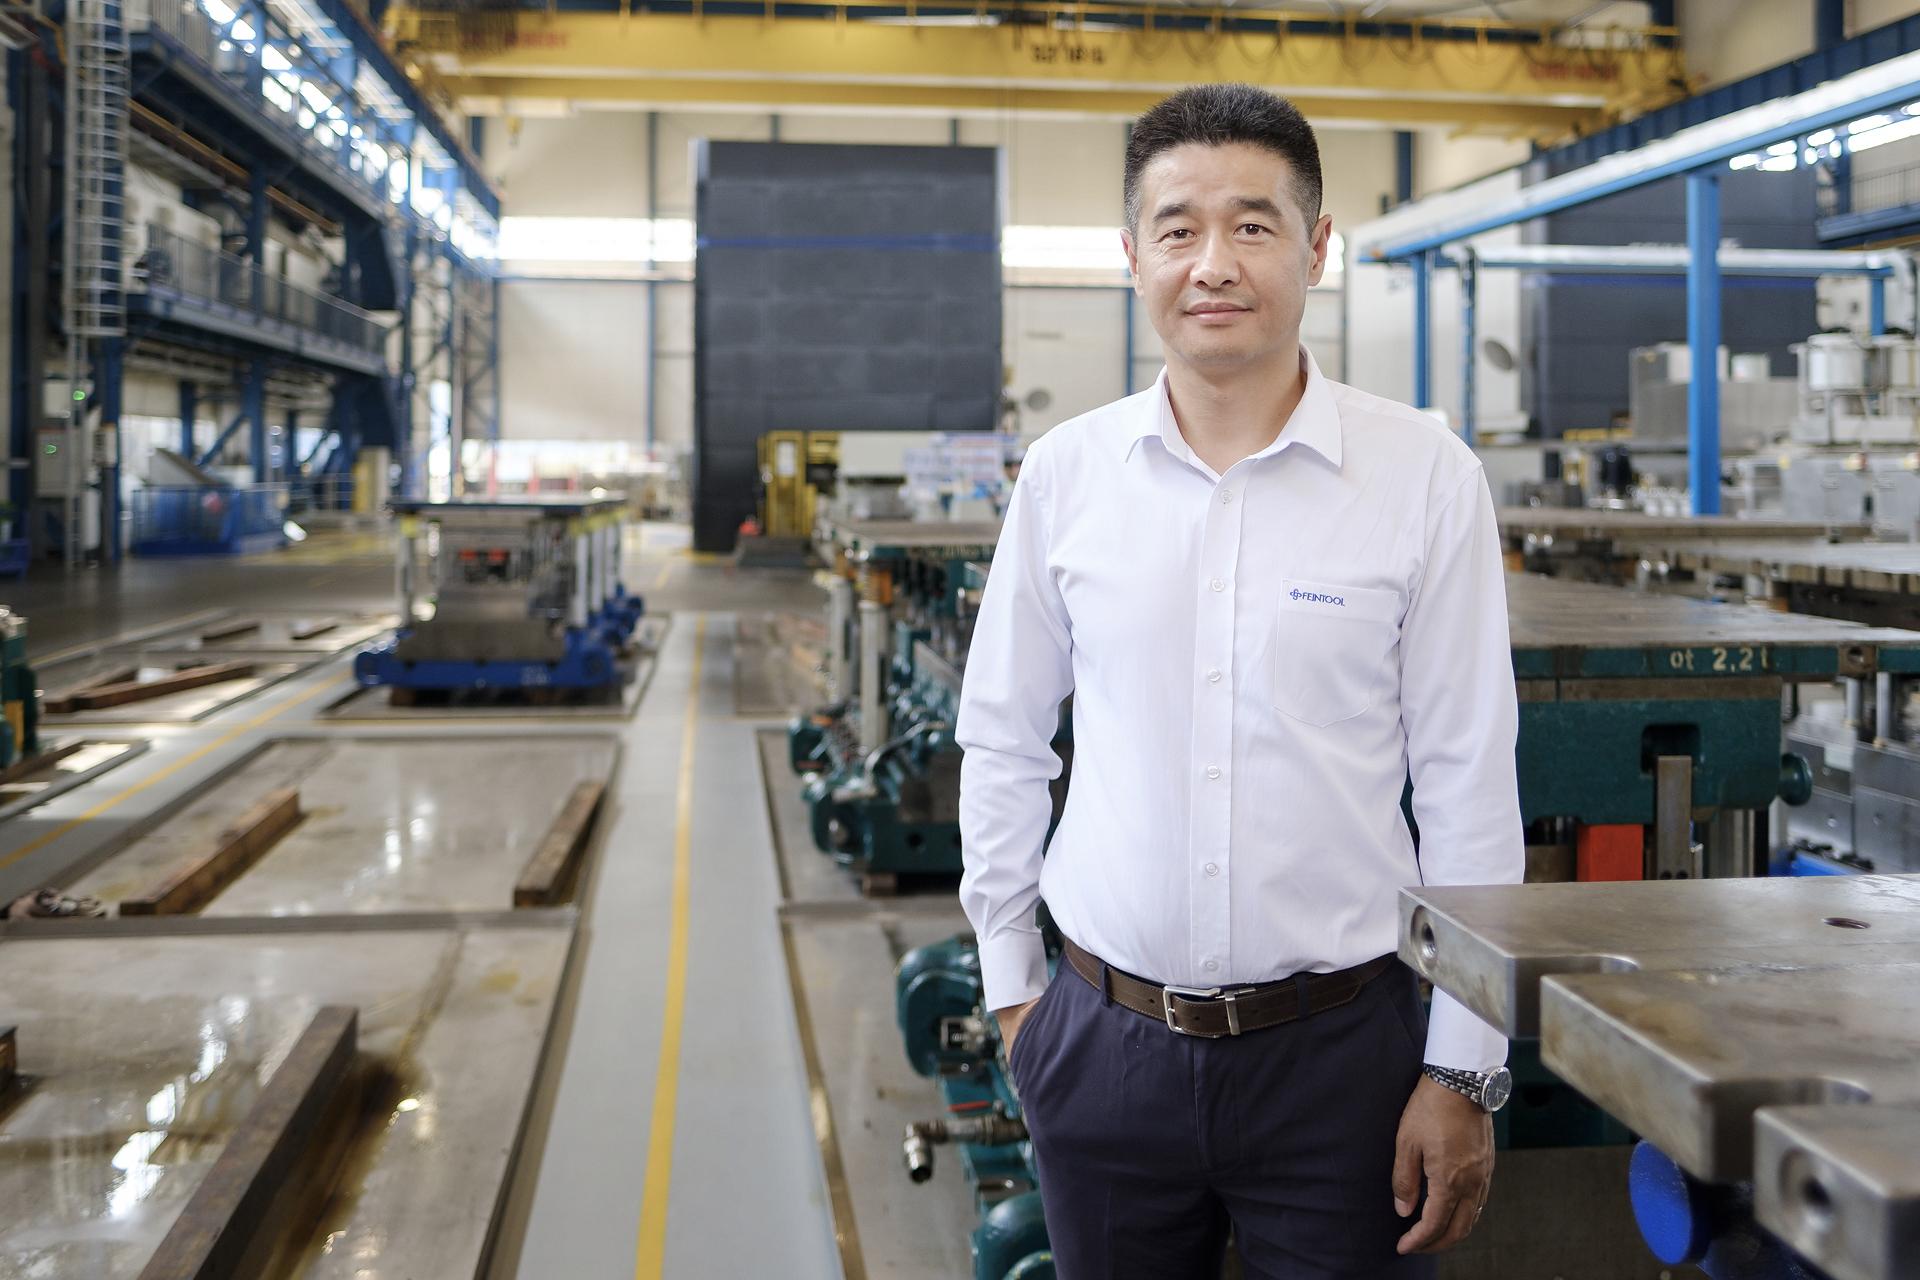 180910-Tianjin-plant-509-1